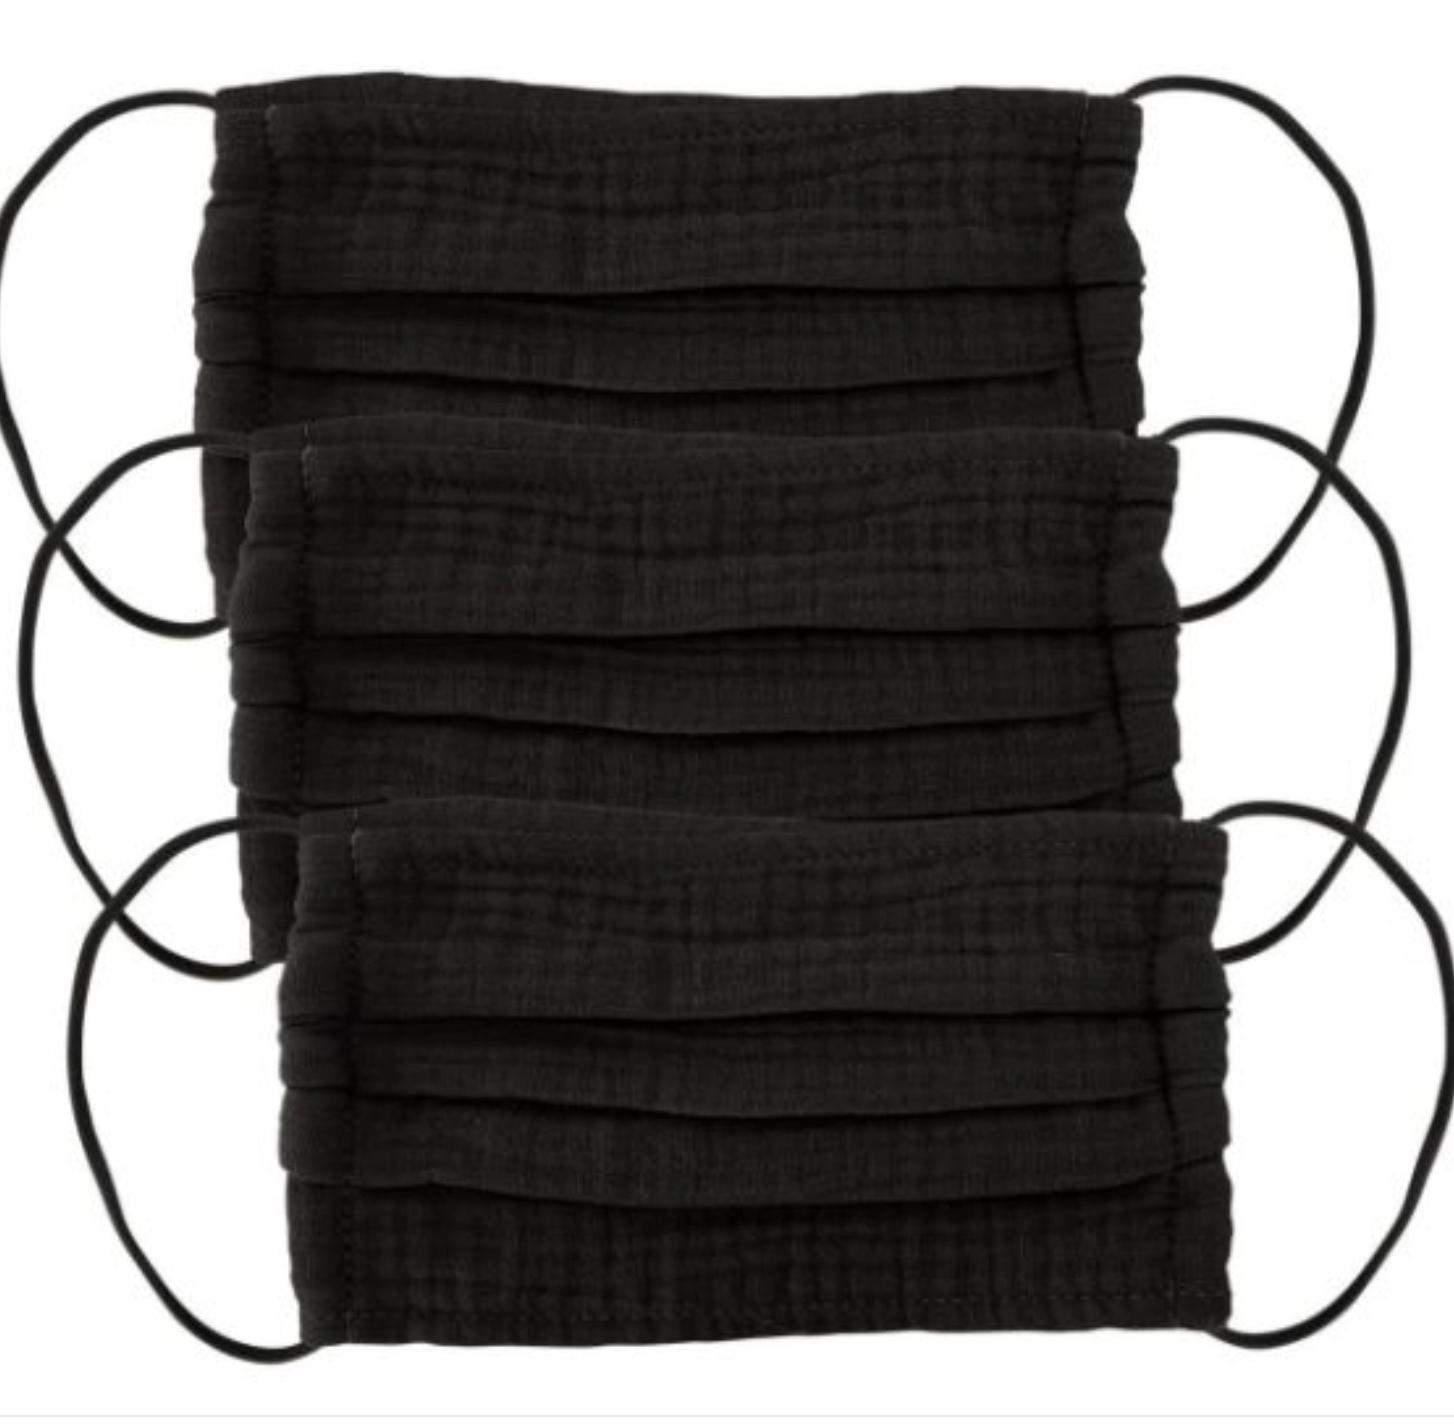 Kitsch Cotton Mask 3pc Set - All Black